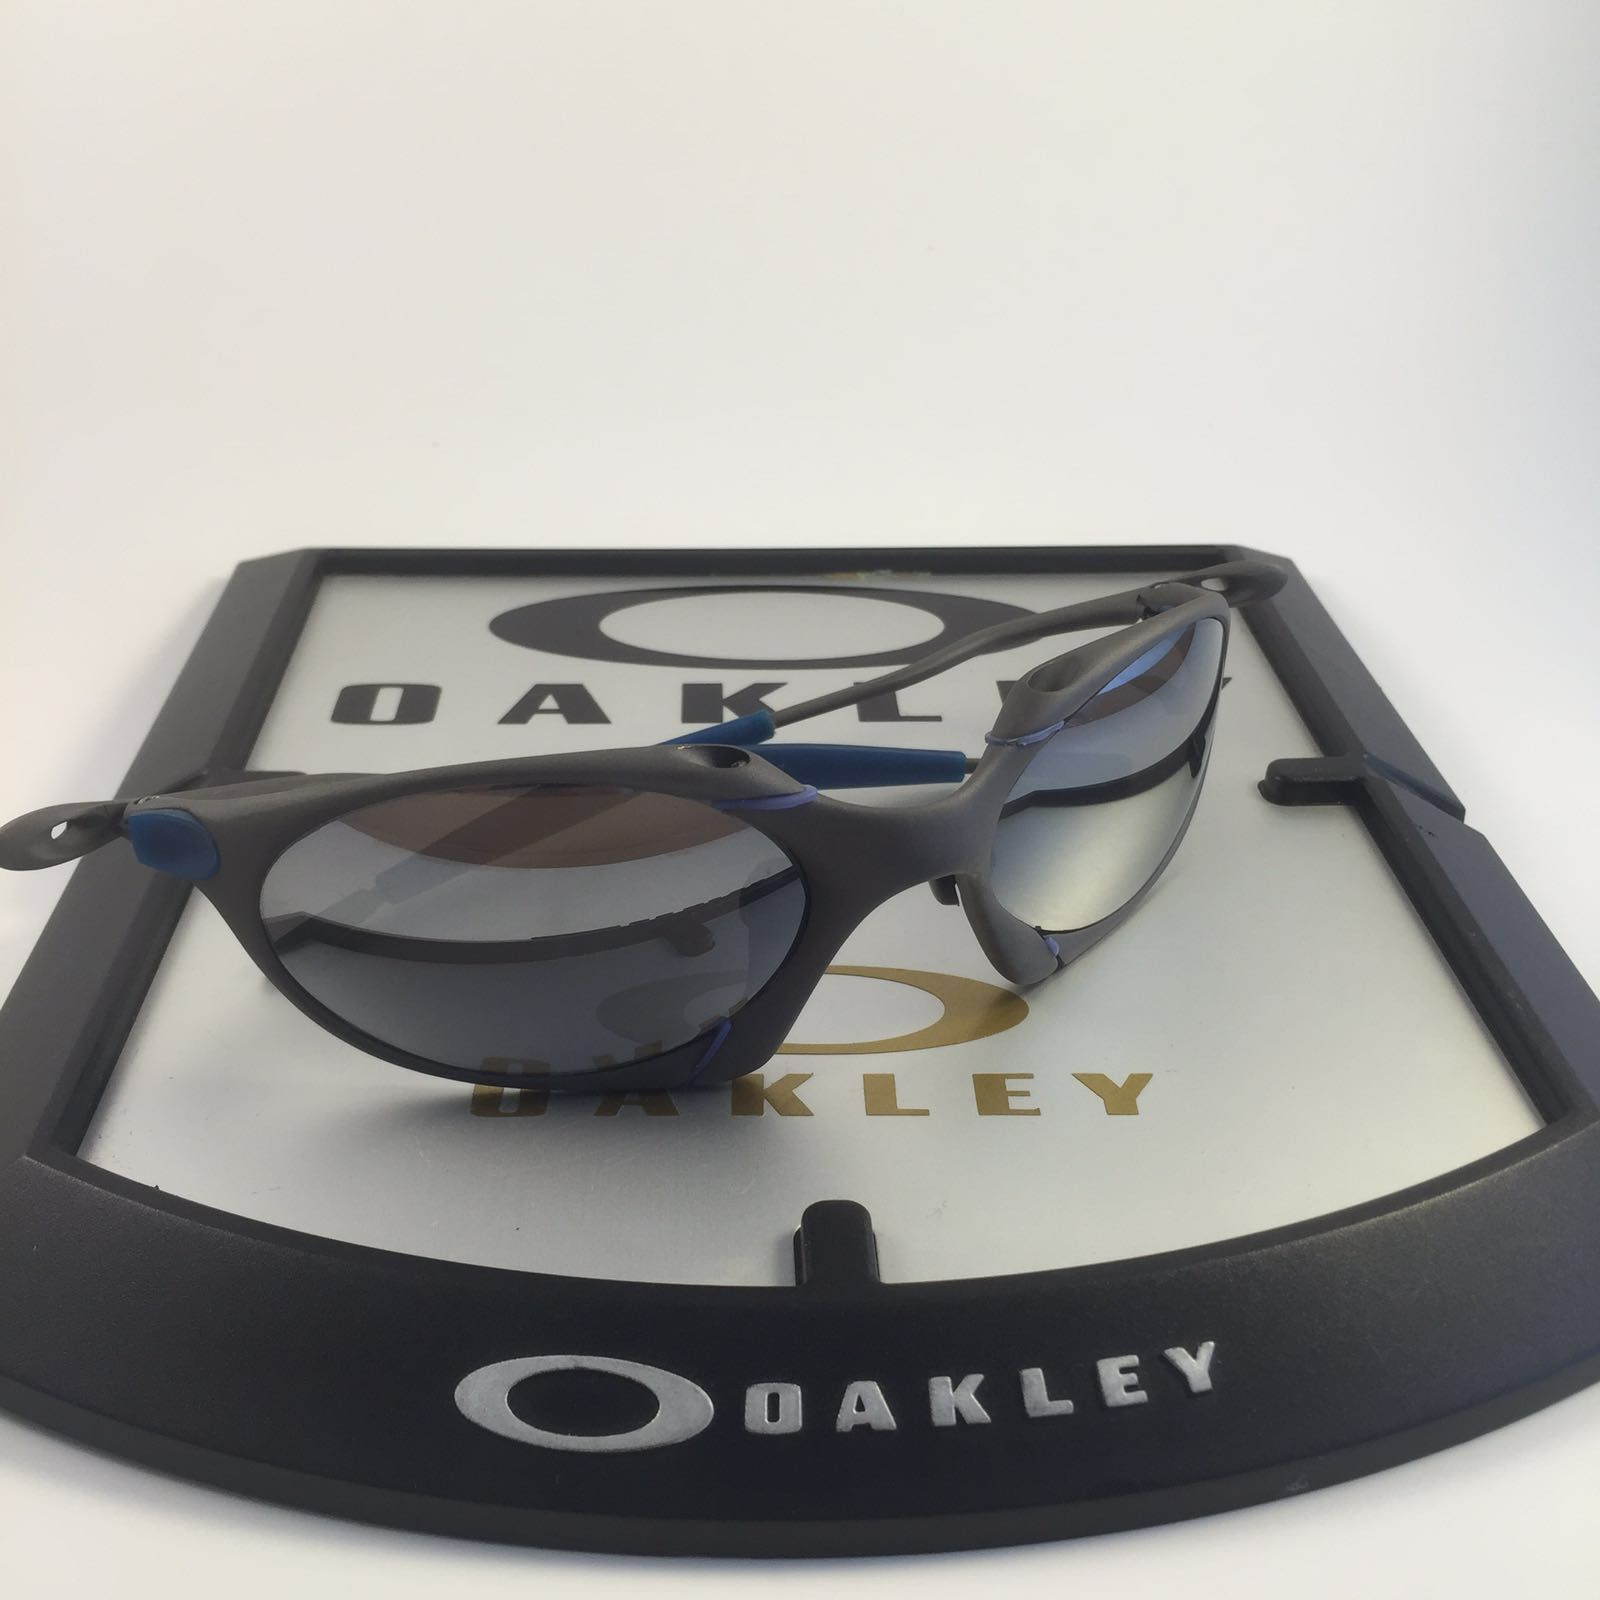 oakley romeo 1 x metal - bdf31193-e98a-47d1-abea-4f5d8efceaef.jpeg